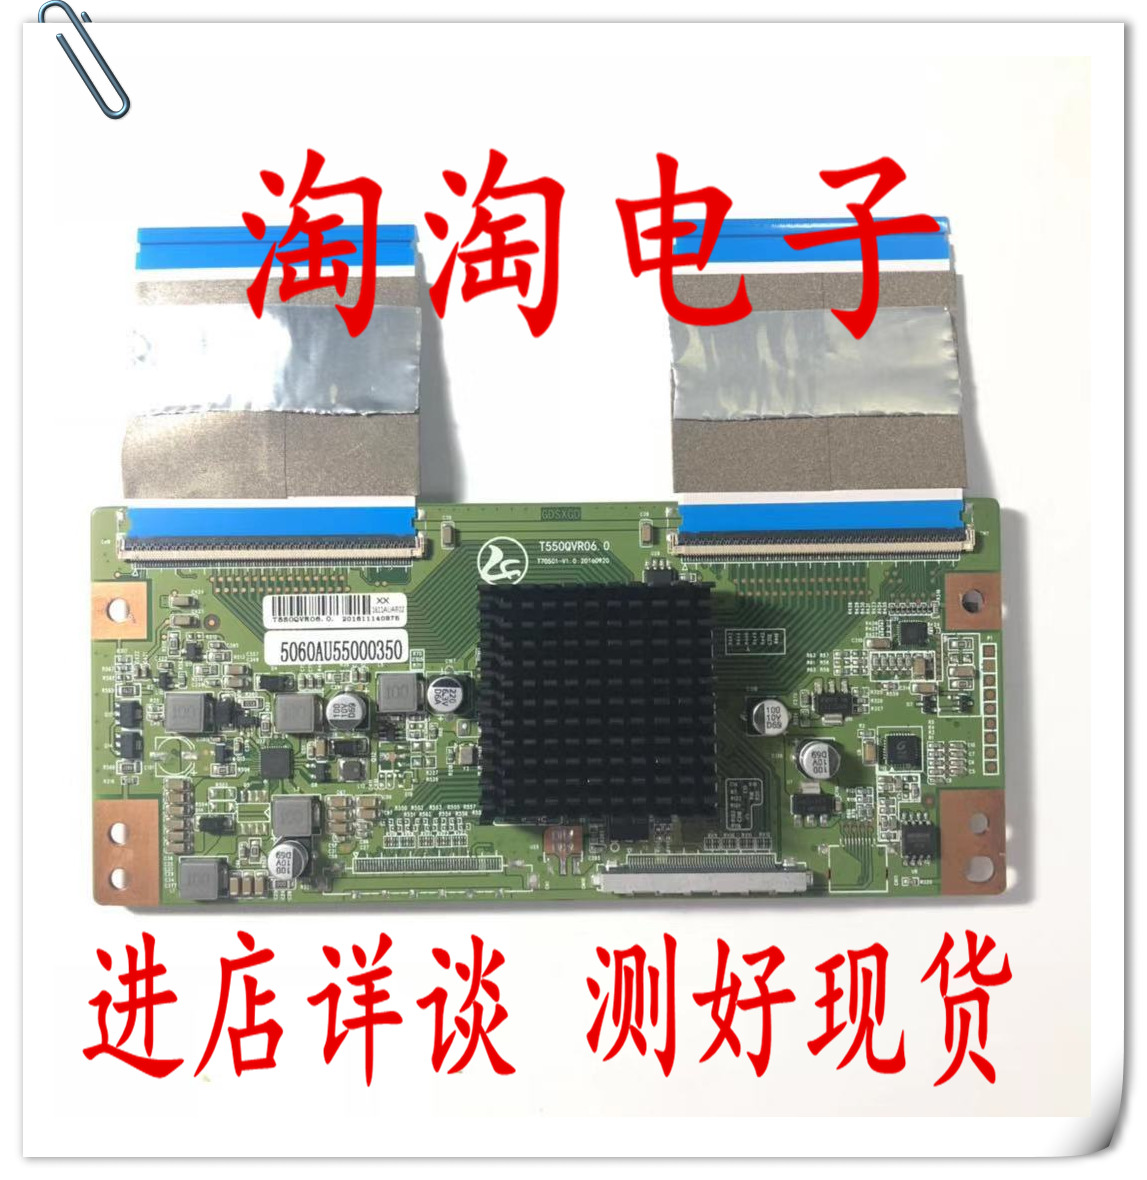 原装三洋55CE56205620HH35810D逻辑板T550QVR06.0T705C1-V1.0